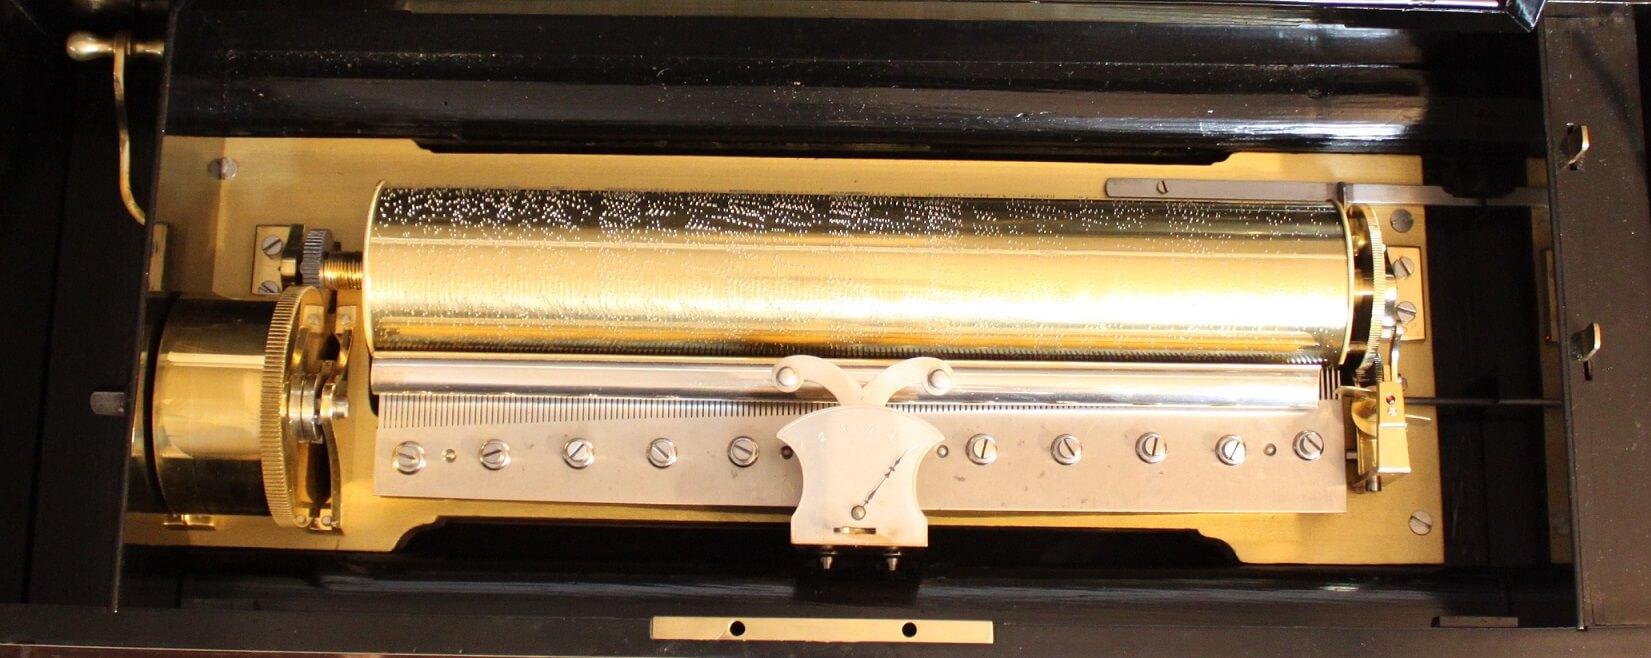 monumental-Swiss-Geneva-Conchon-mandoline-quatuor-cylinder-music-box-musical-animated